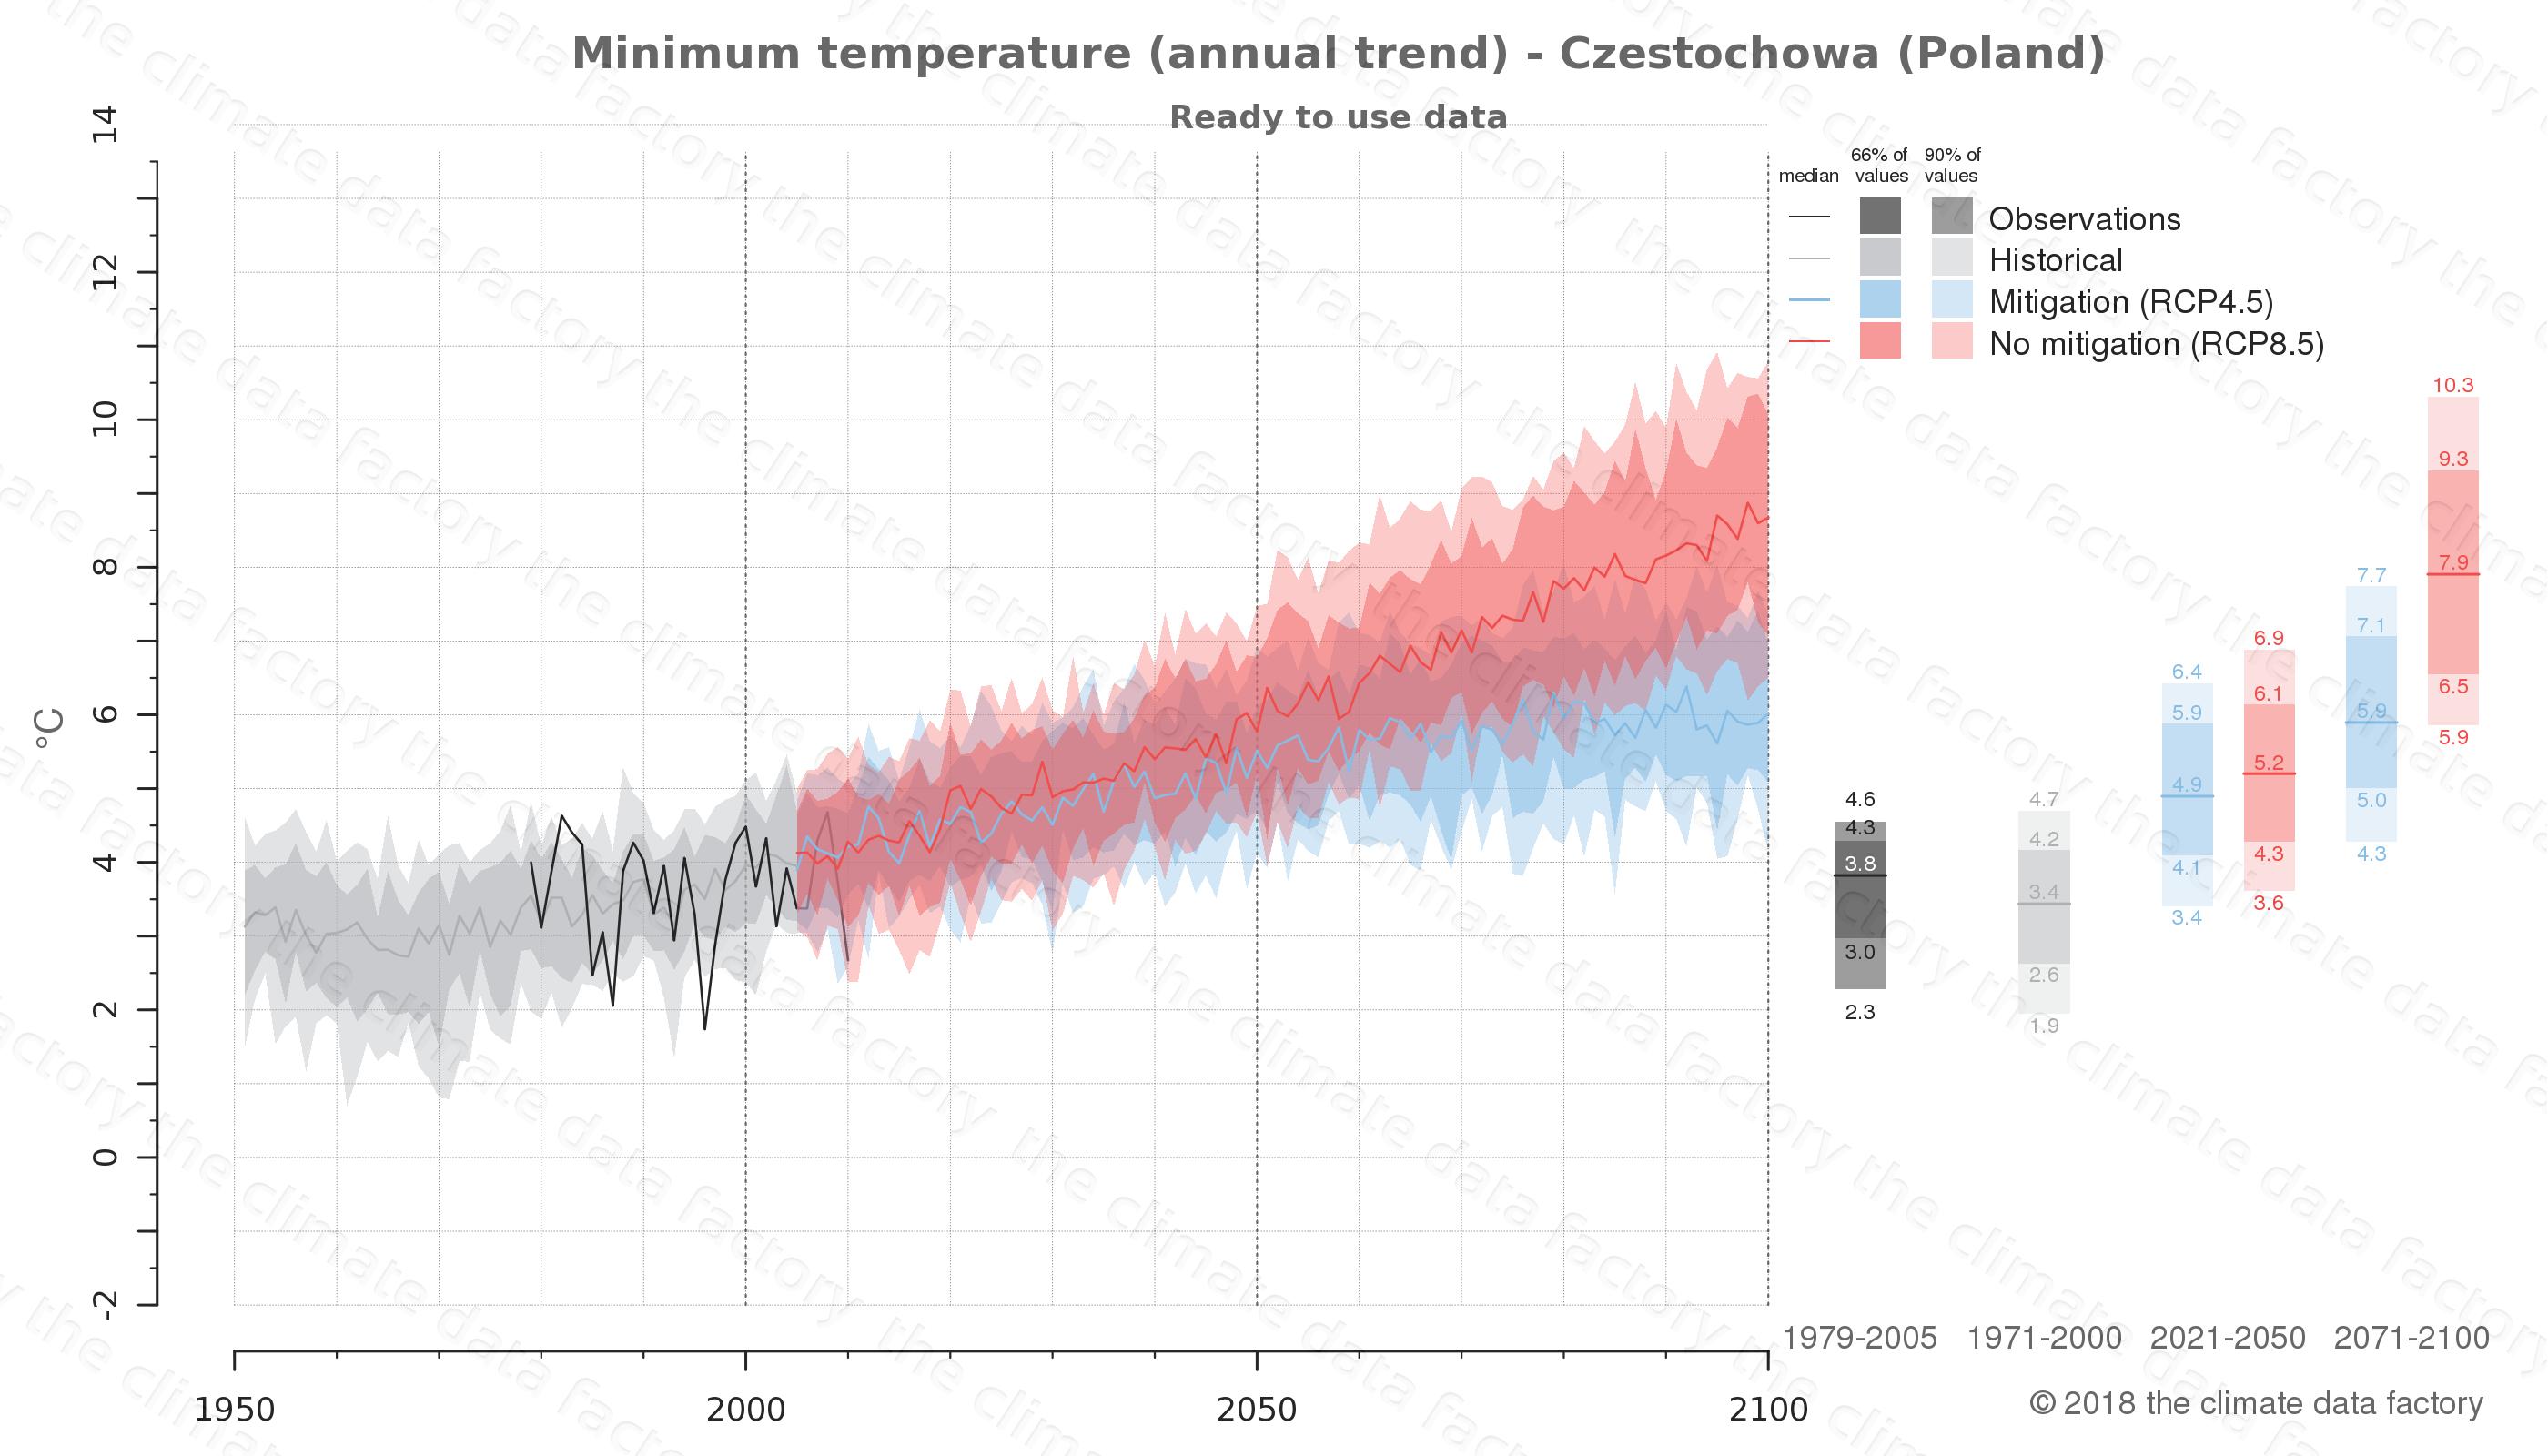 climate change data policy adaptation climate graph city data minimum-temperature czestochowa poland